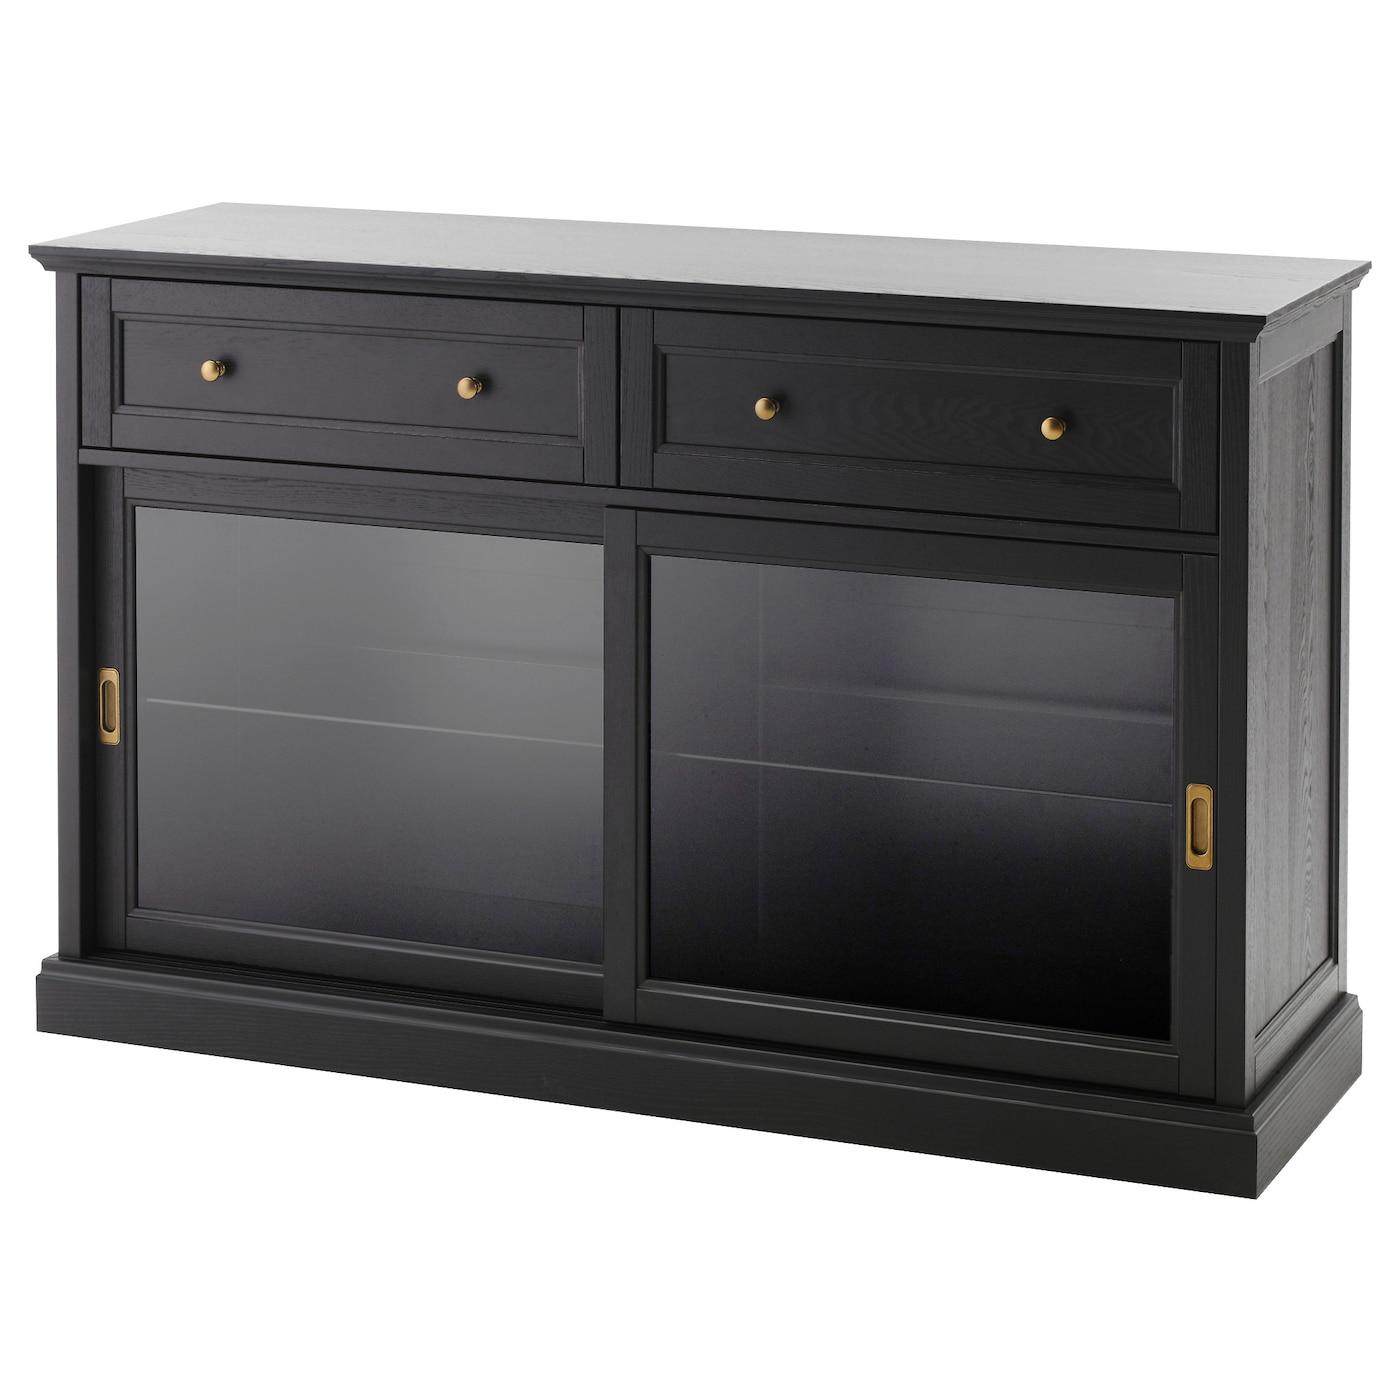 Malsjo Buffet Basiselement Zwartgebeitst 145x92 Cm Ikea